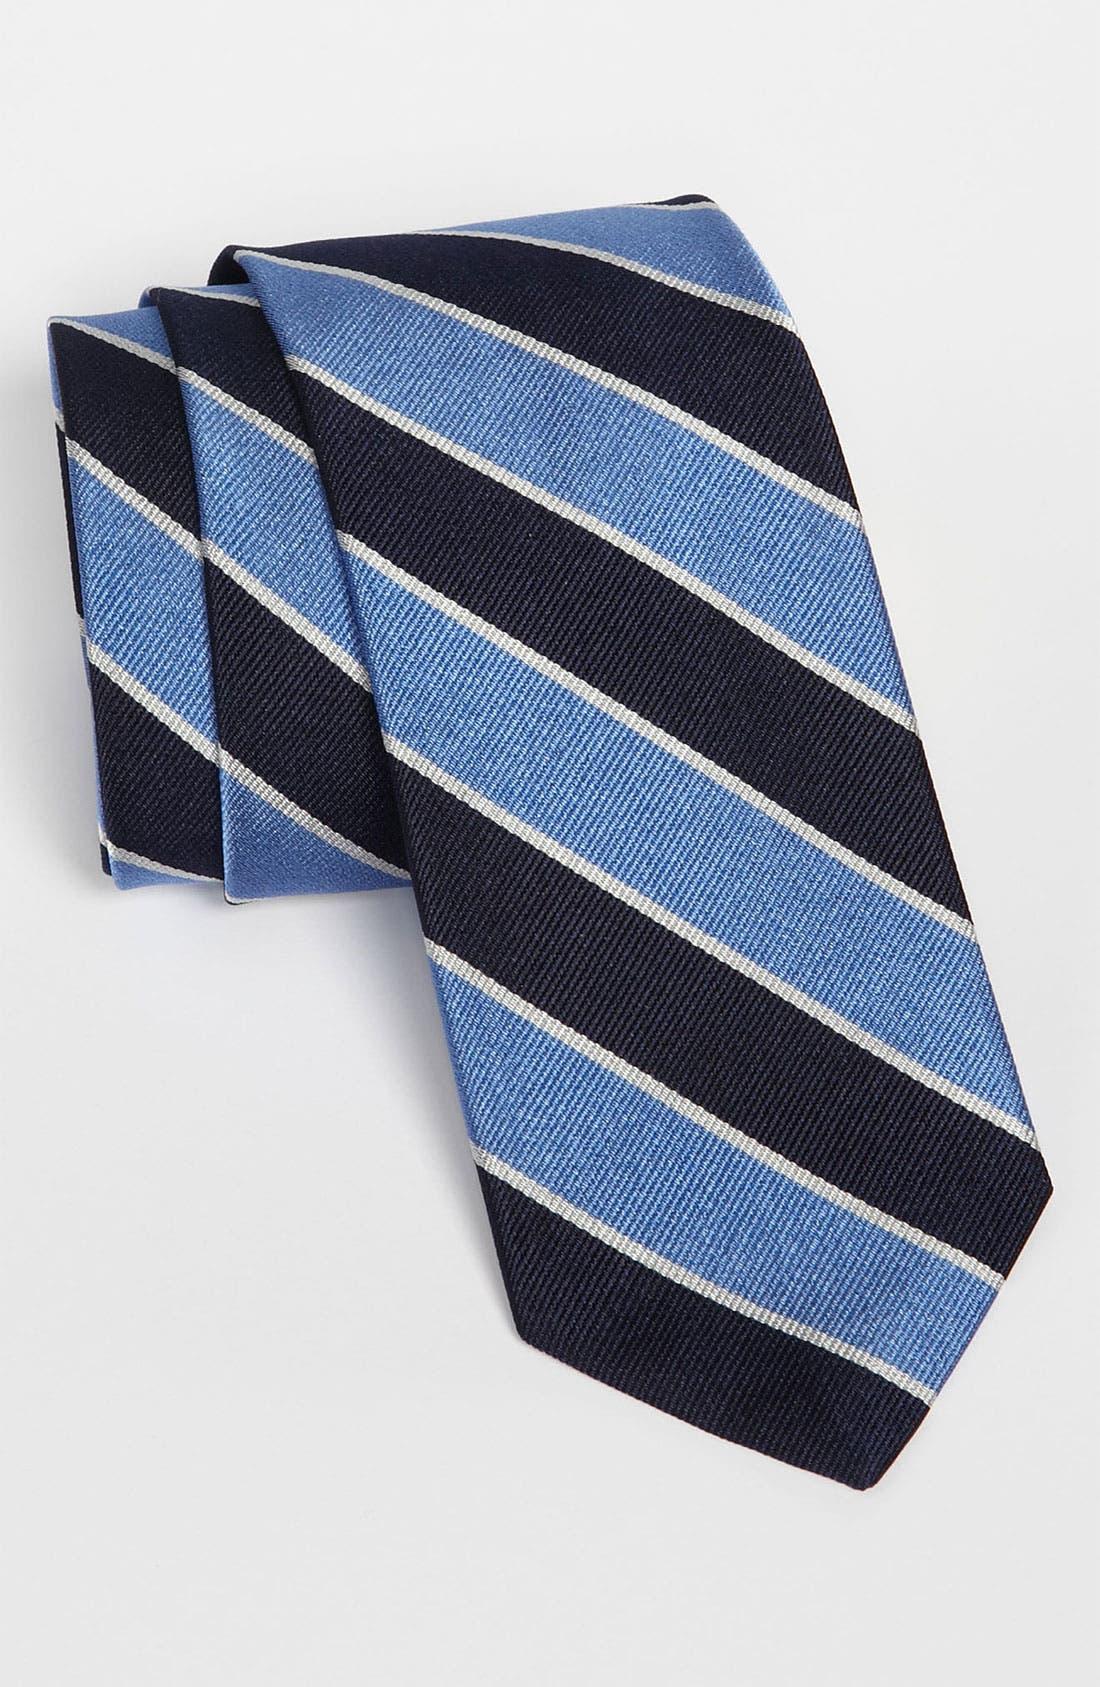 Alternate Image 1 Selected - Jack Spade Woven Silk Tie